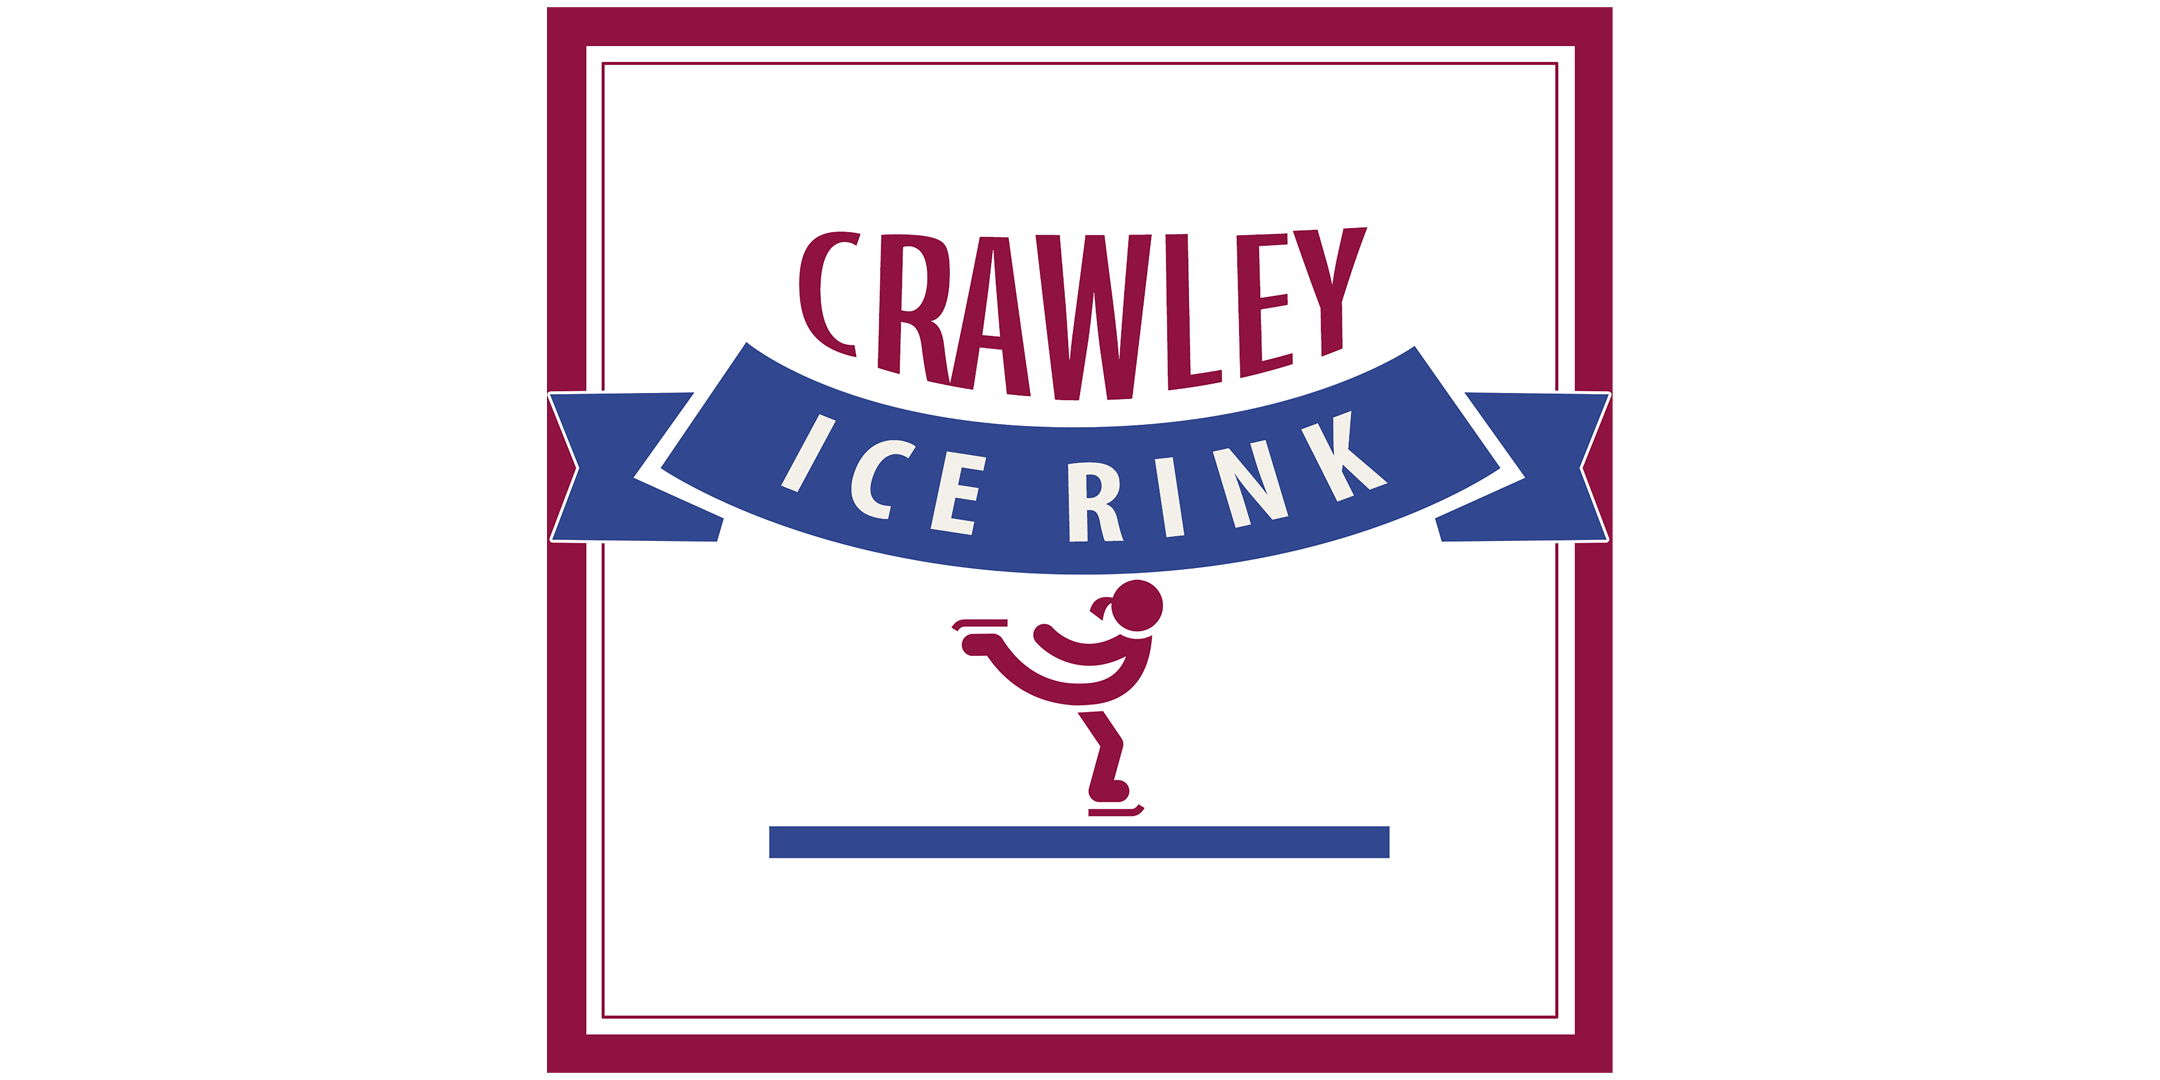 Crawley Ice Rink - 19th December (Off Peak)